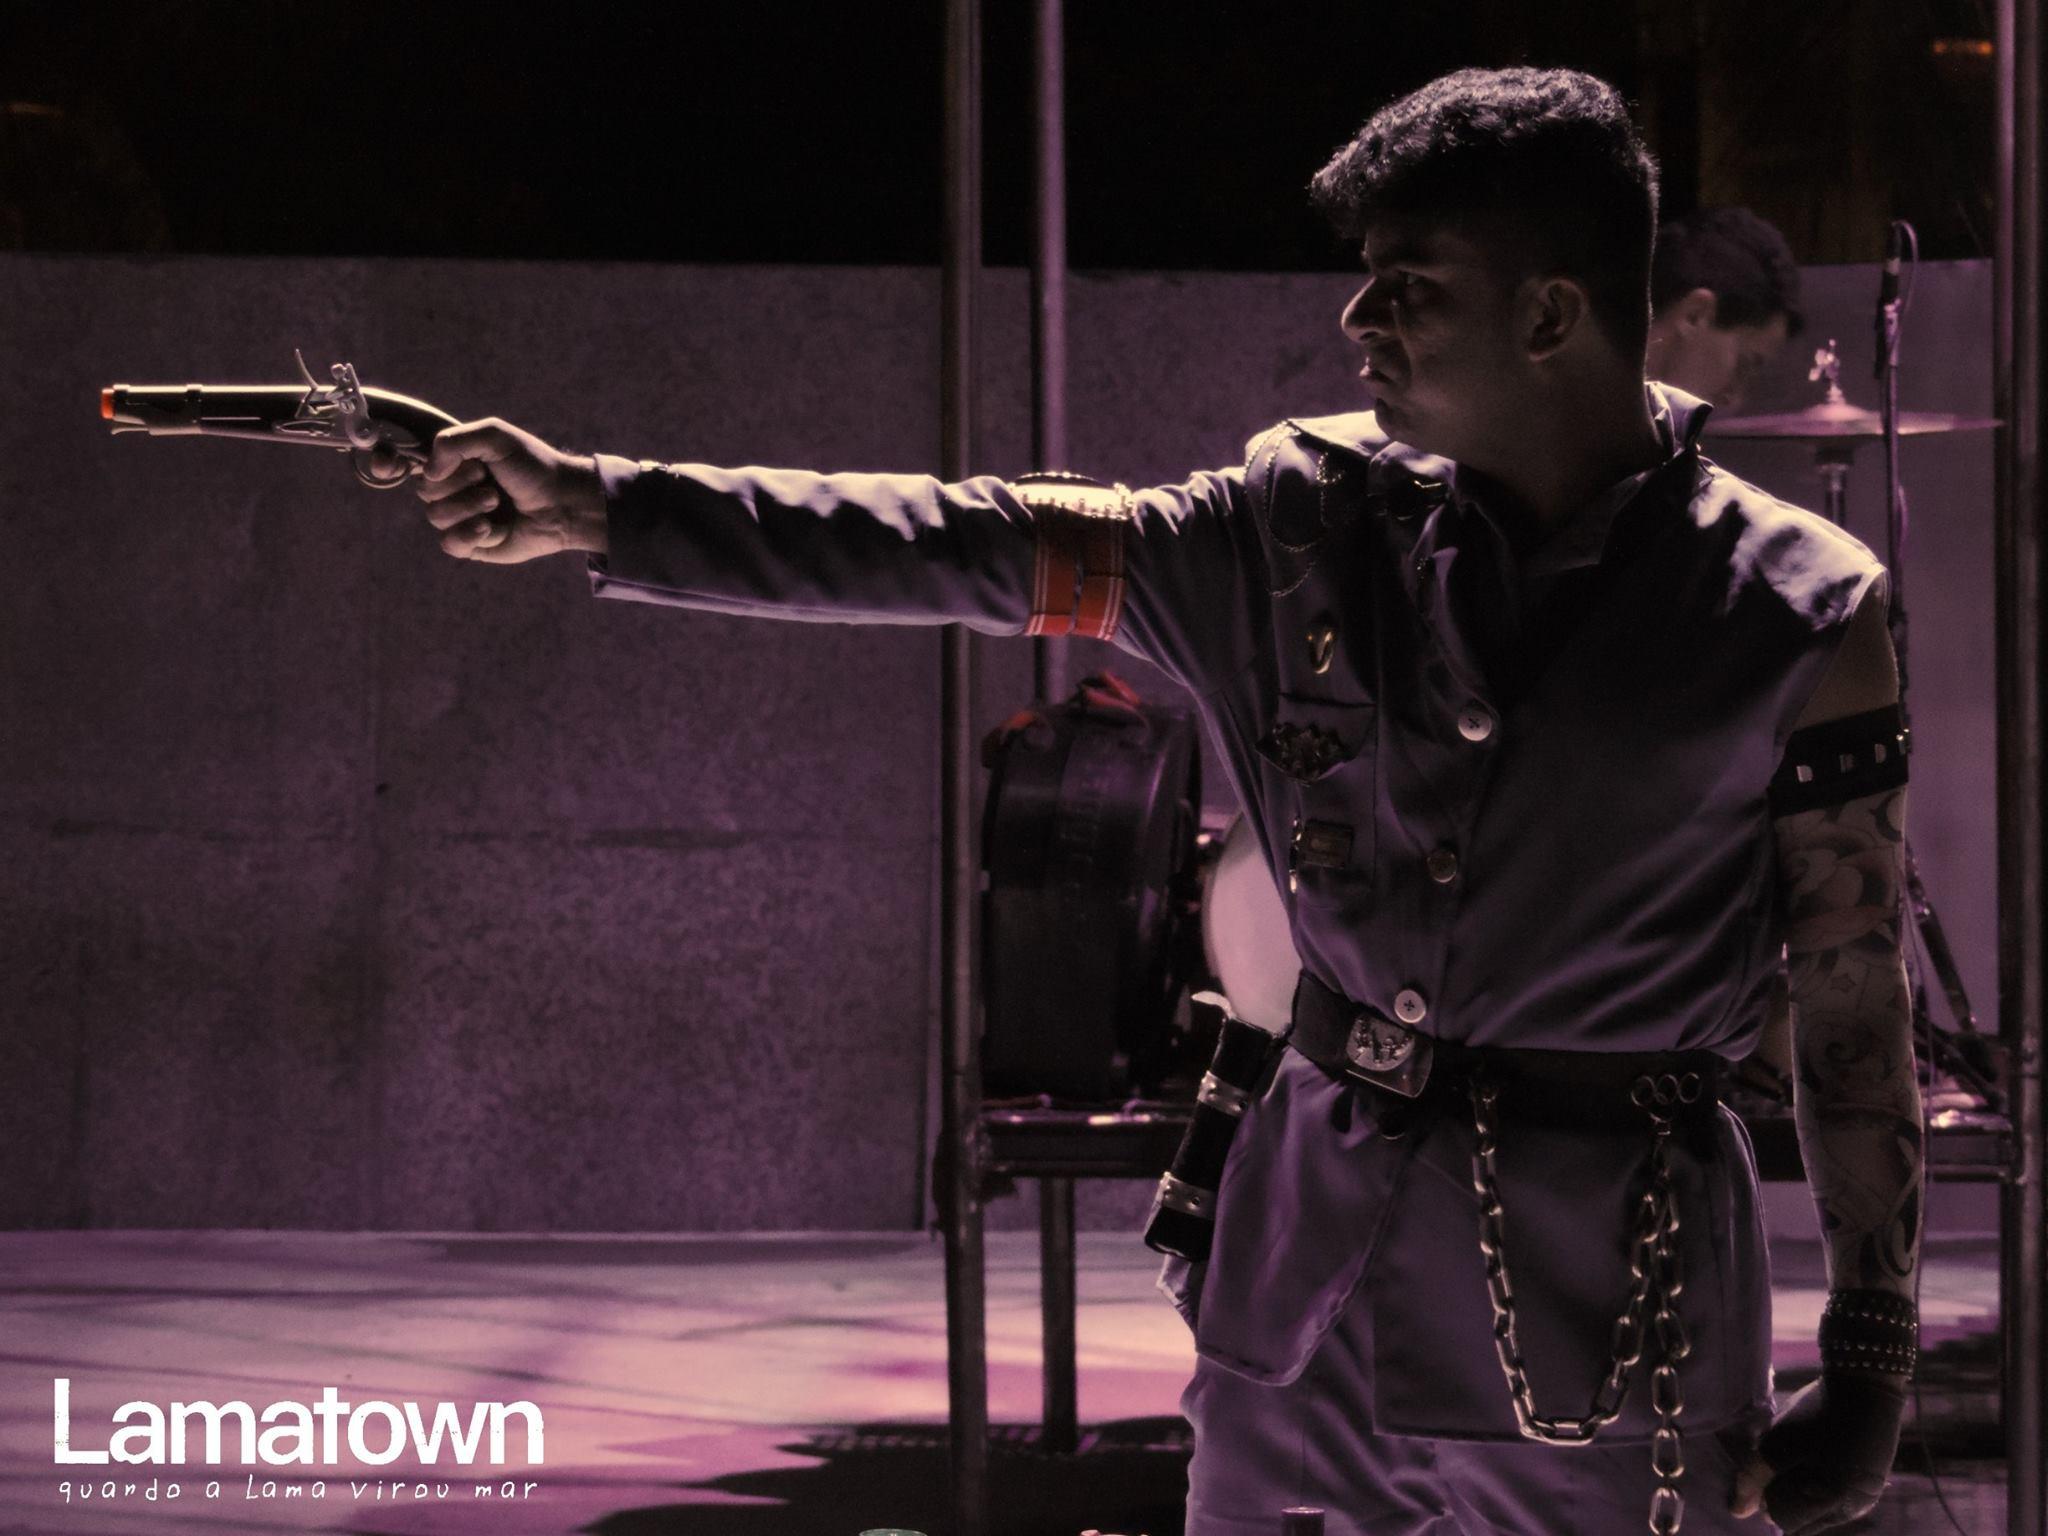 Lamatown. General Shoots the Revolutionary.